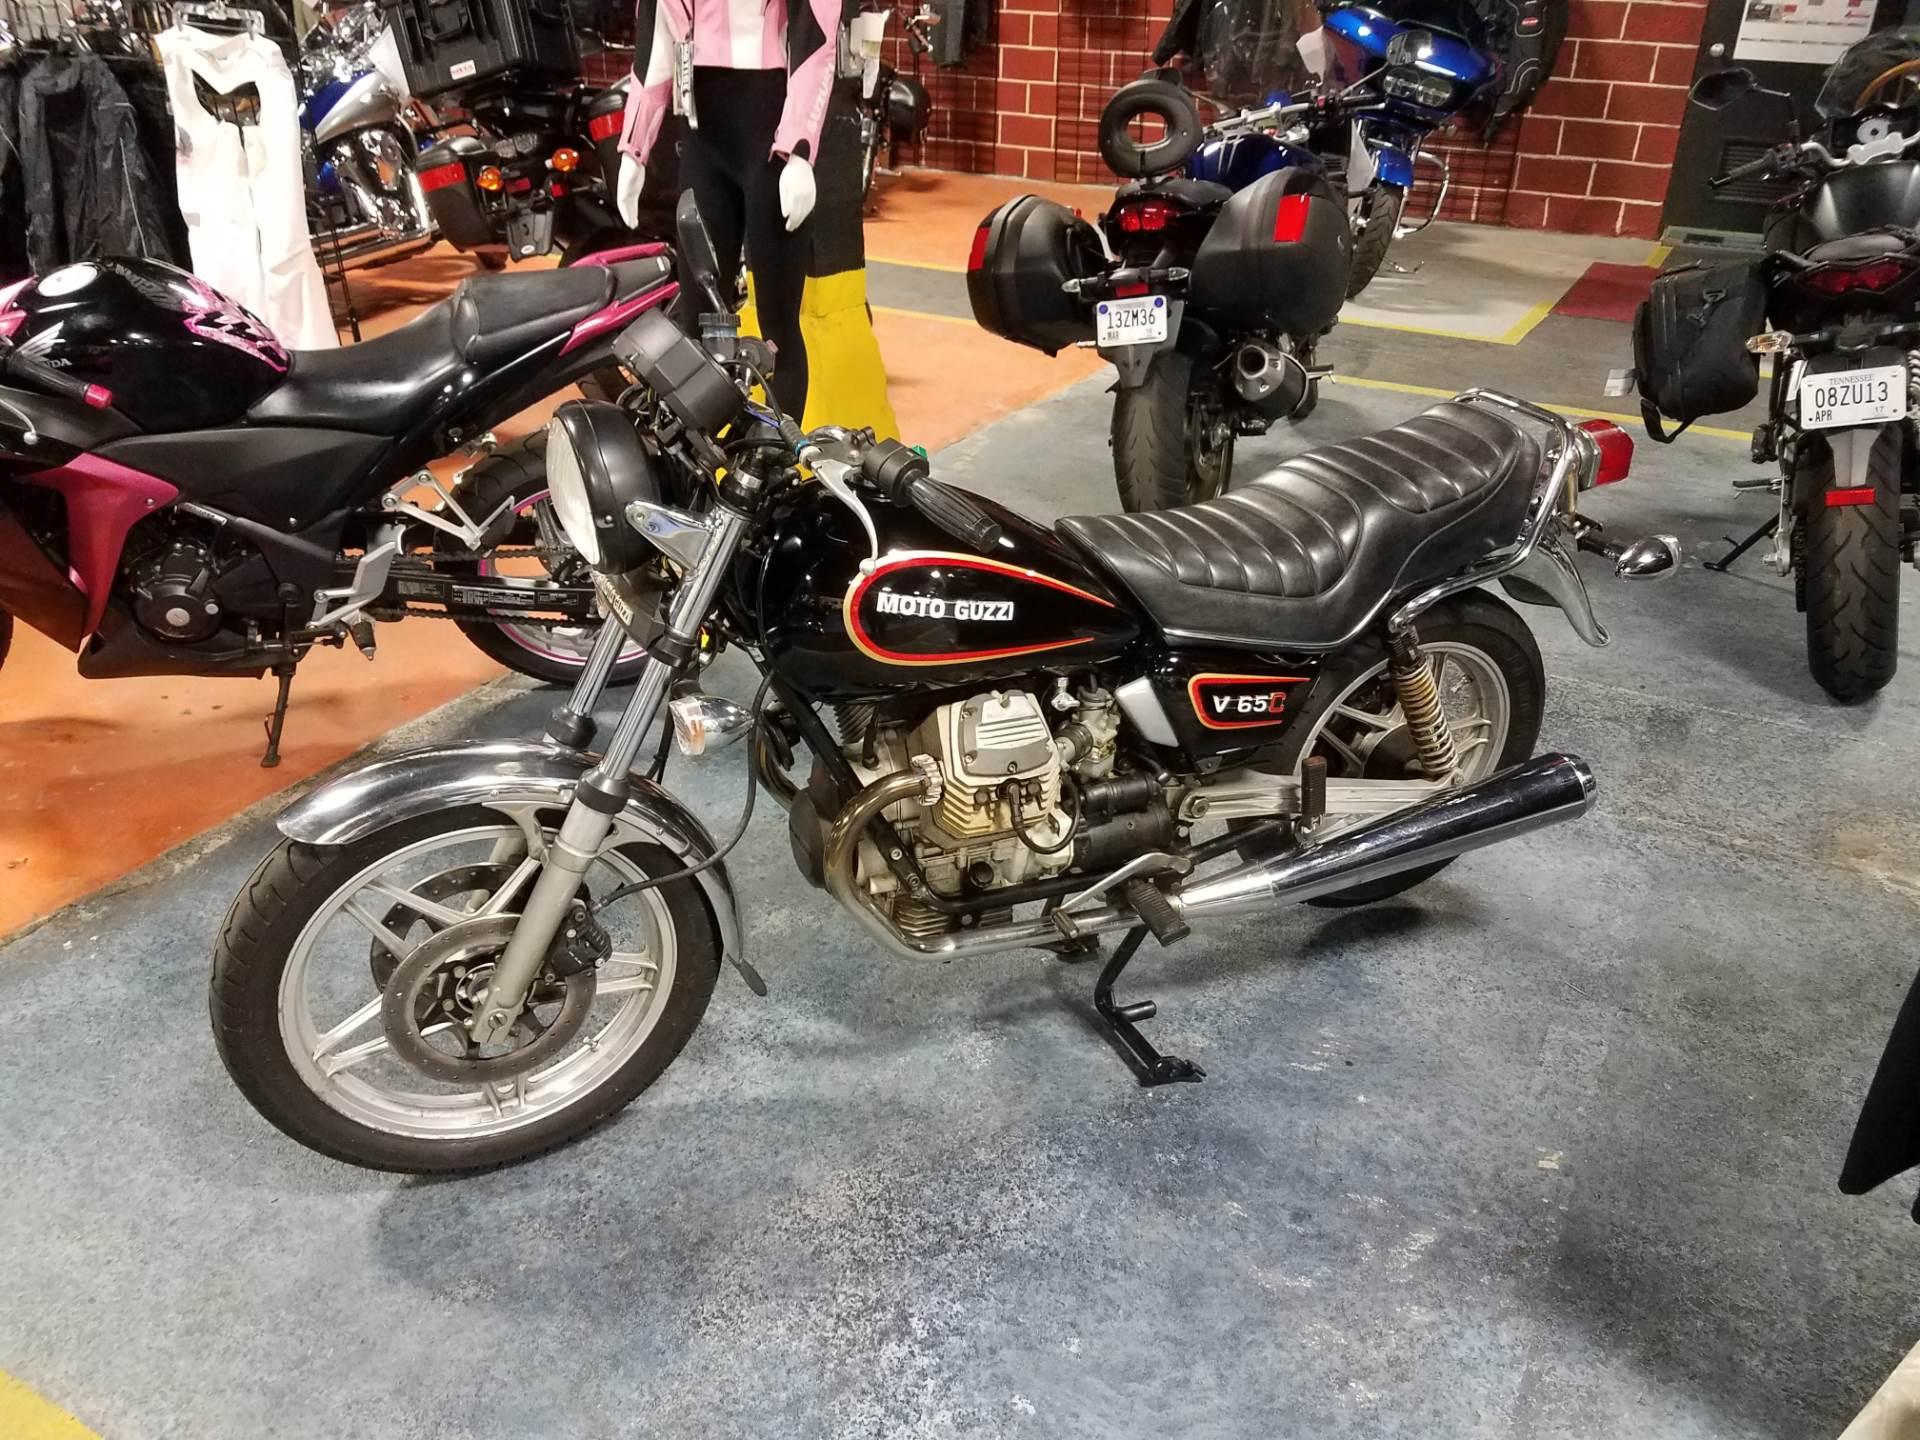 1984 Moto Guzzi V-65 in Kingsport, Tennessee